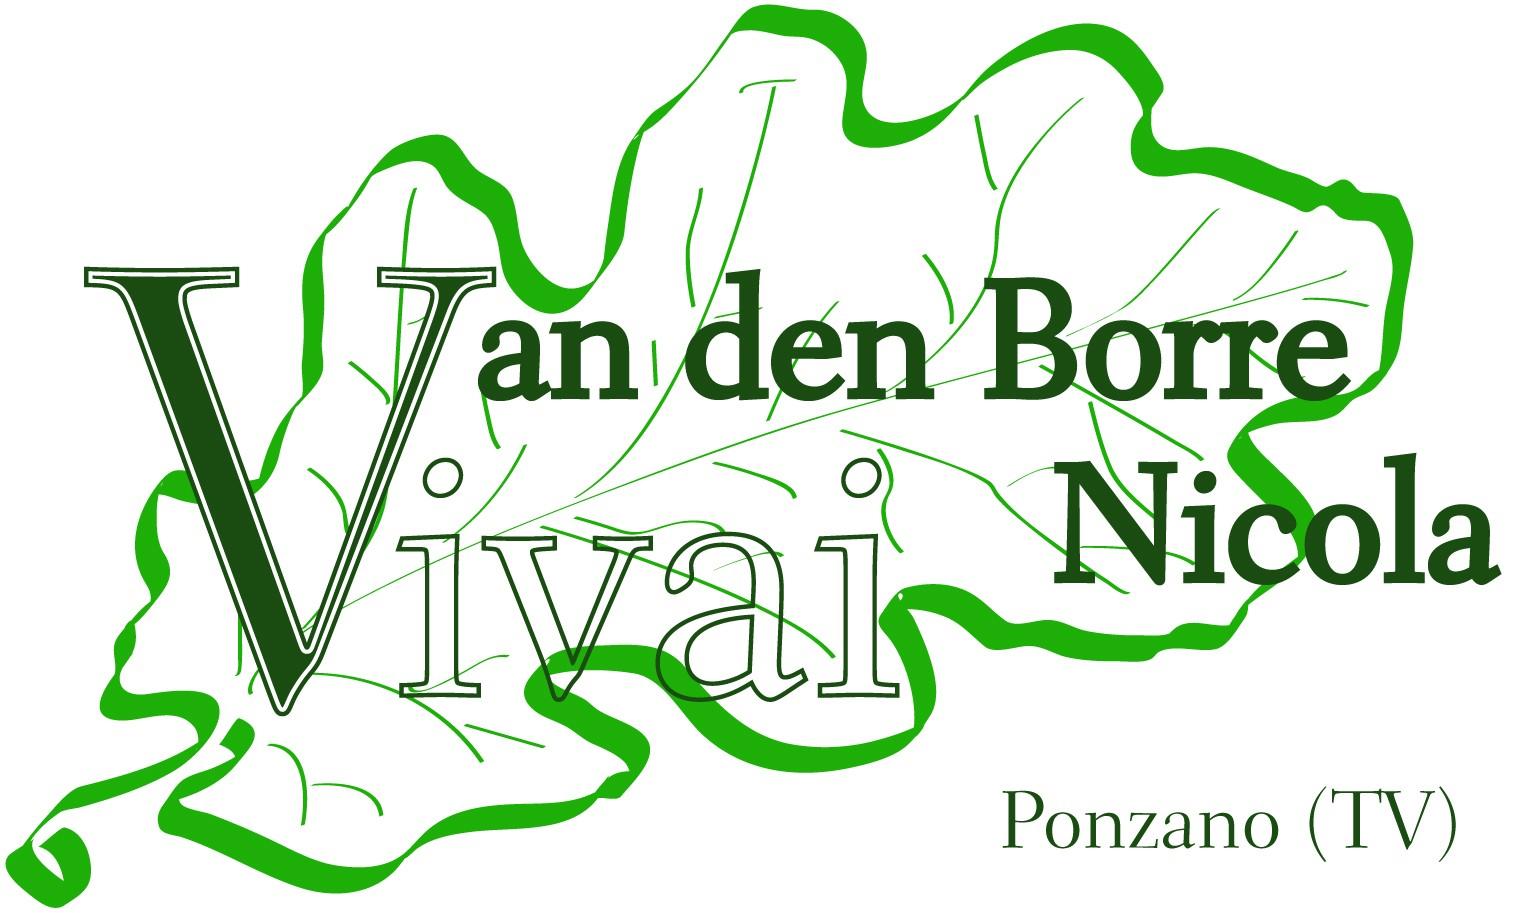 Van Den Borre Nicola Vivai Piante Dal 1854